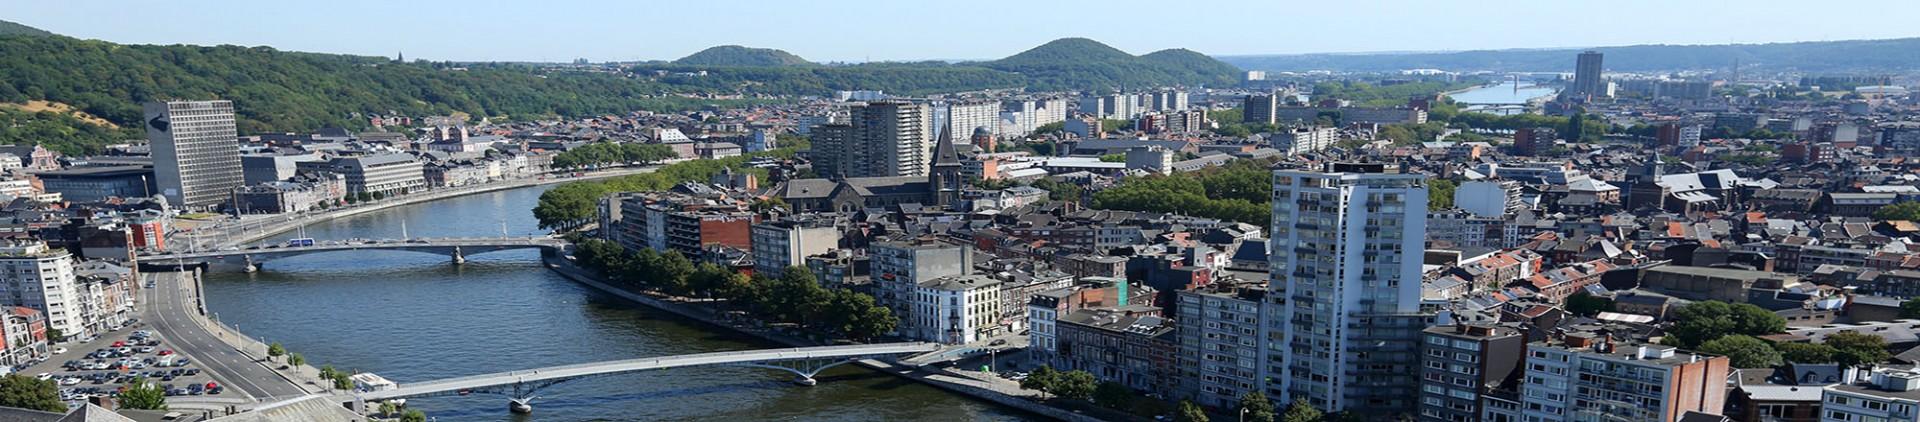 Liège - Ardenne Incoming